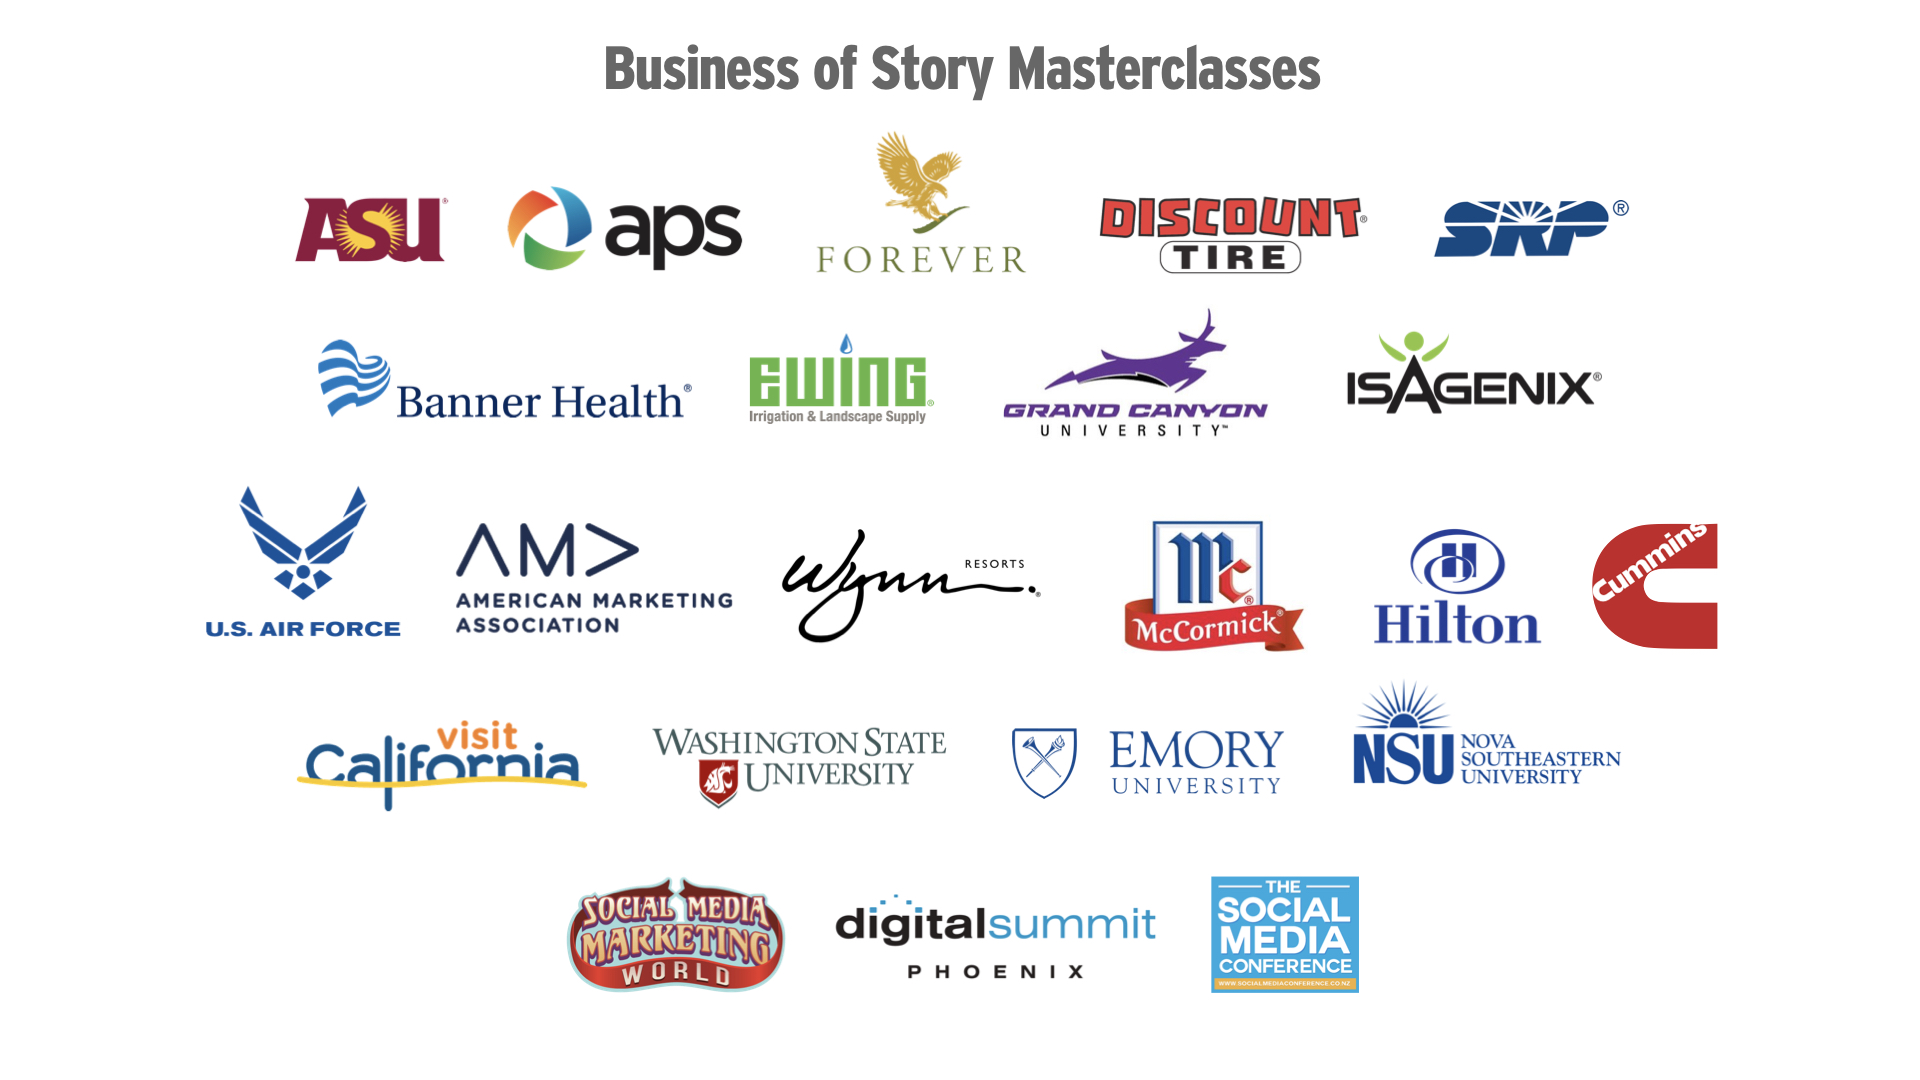 Business of Story Masterclass